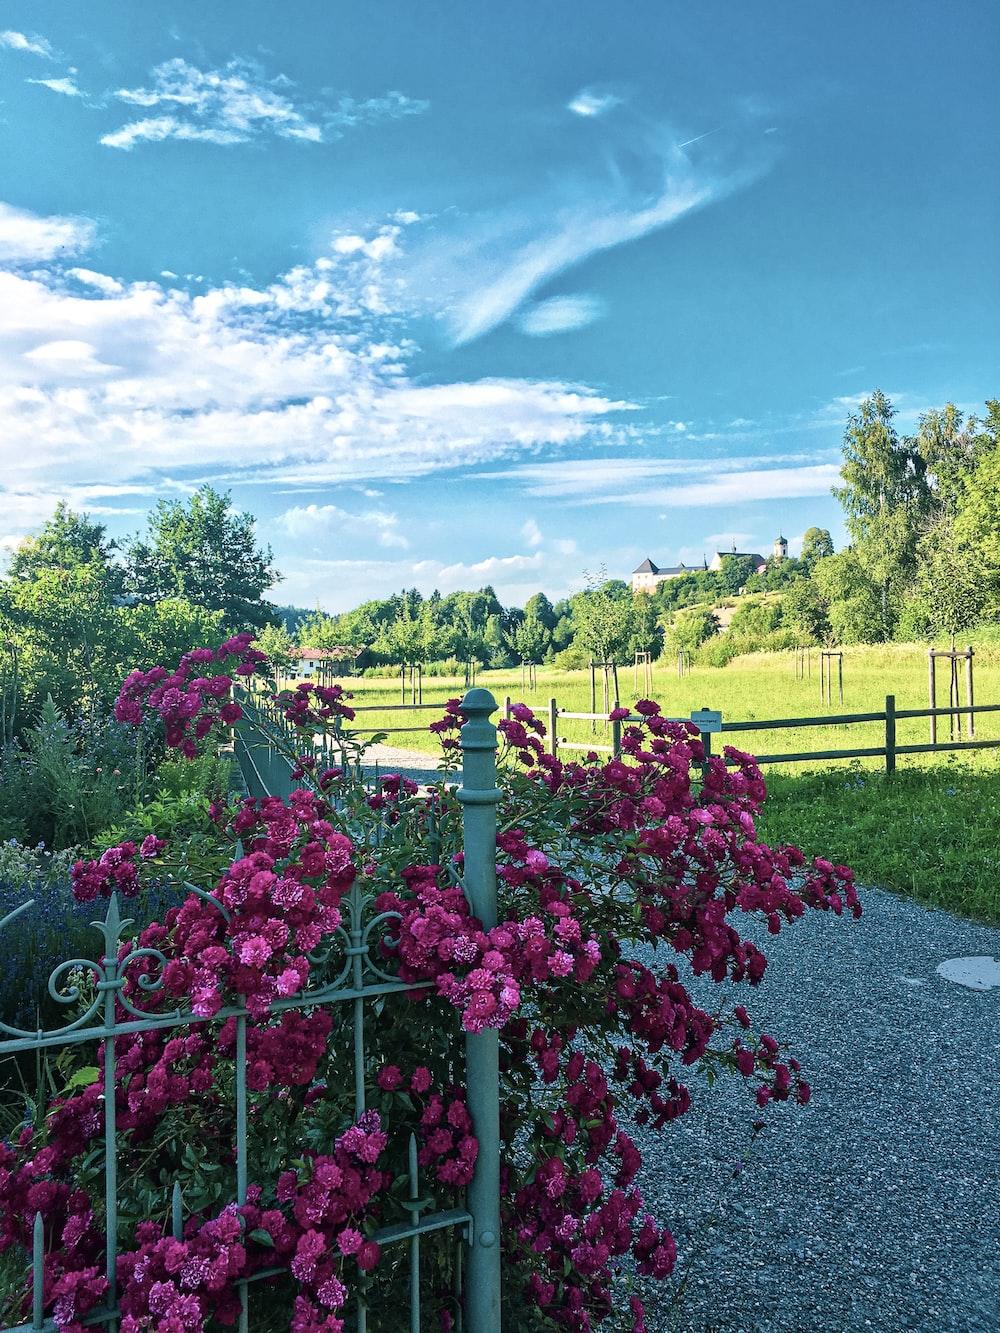 fuchsia flowers by the railings